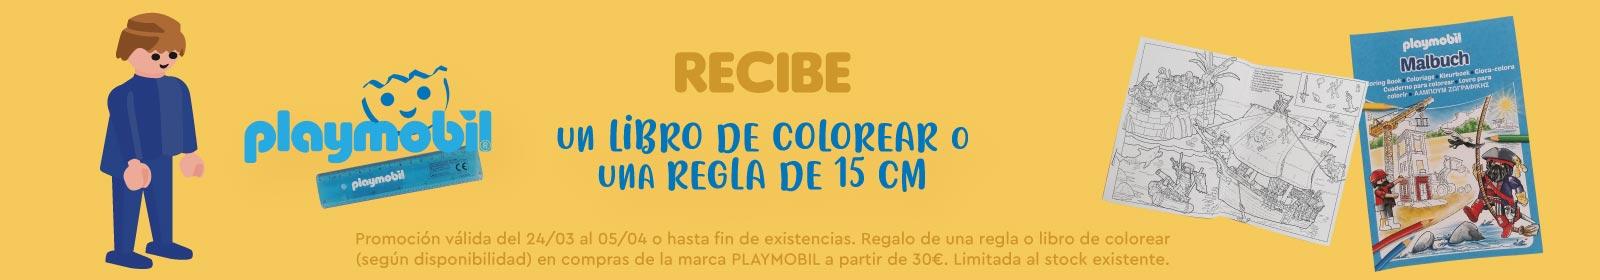 Promociones Playmobil